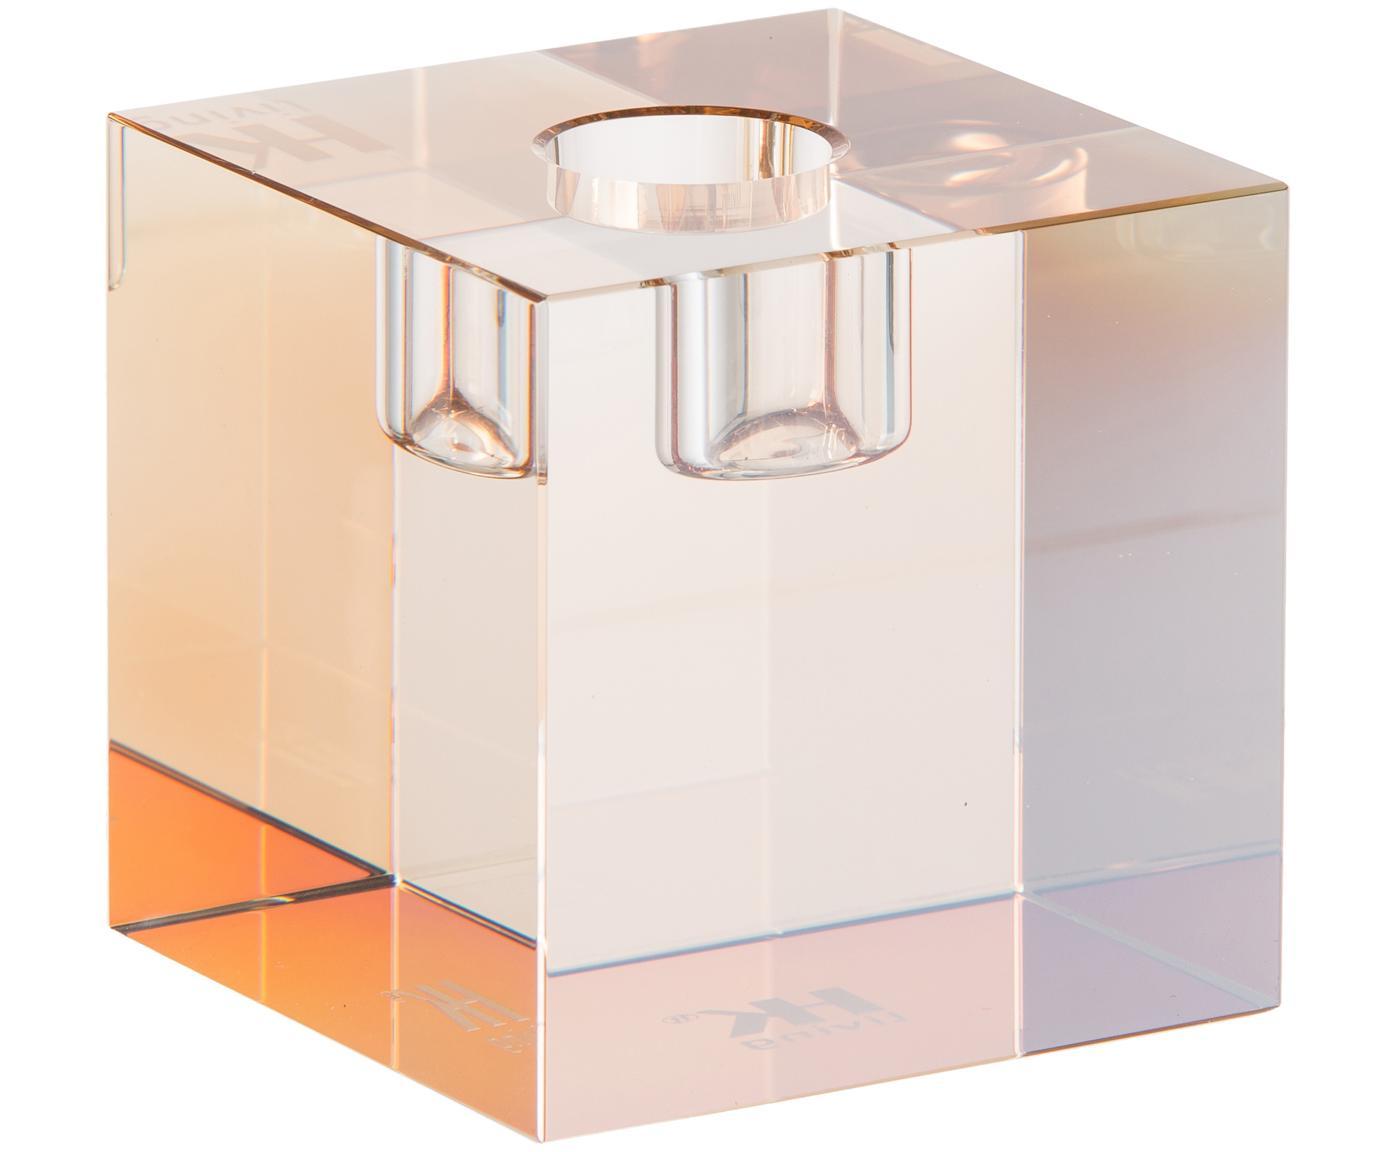 Kandelaar Cubic, Kristalglas, Amberkleurig, 7 x 7 cm